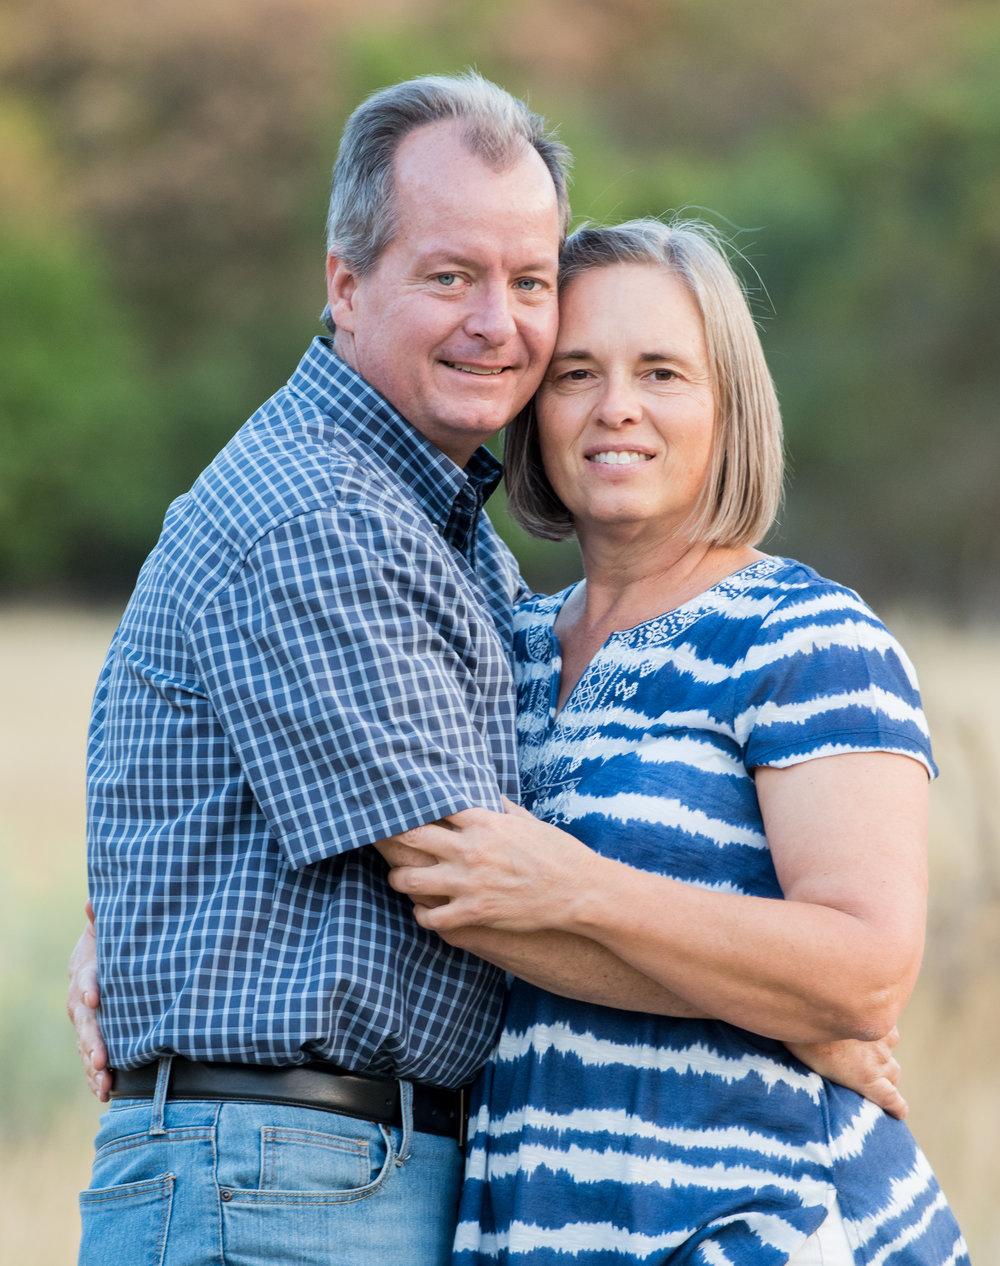 utah-family-photography-couple